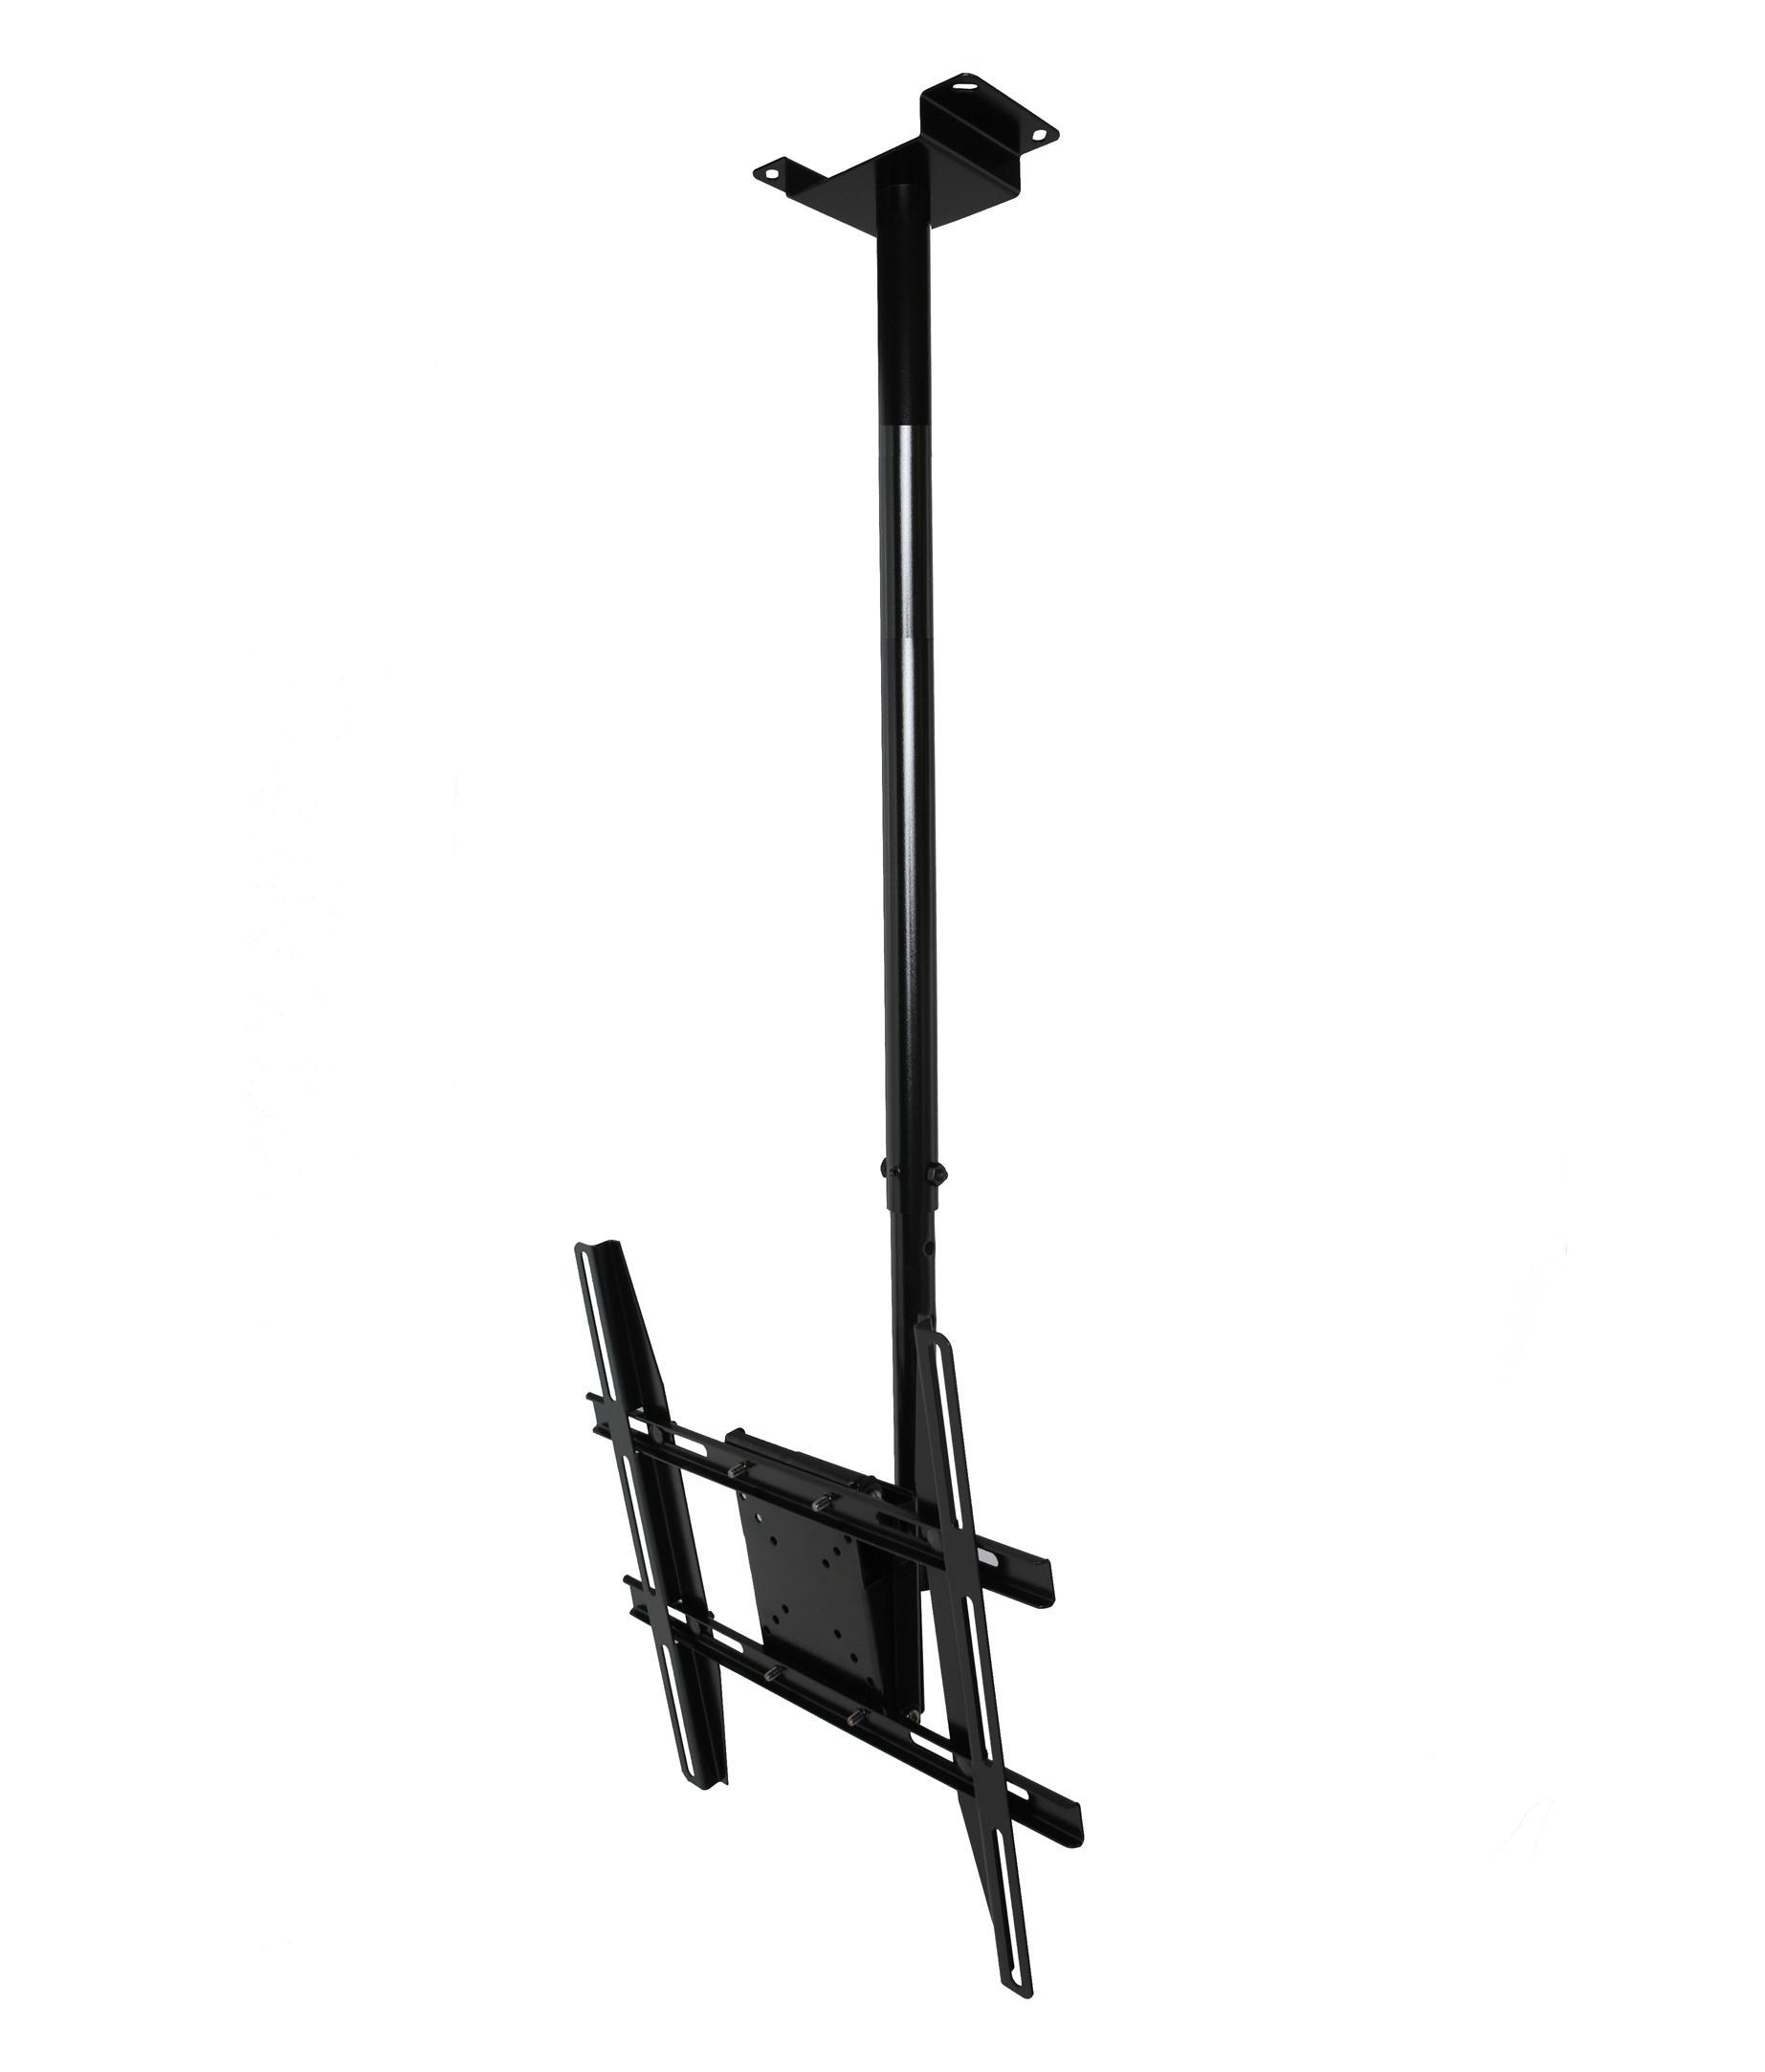 com tilt led videosecu industrial tv scientific bracket lcd most mount swivel mm dp vesa amazon ceiling monitor for